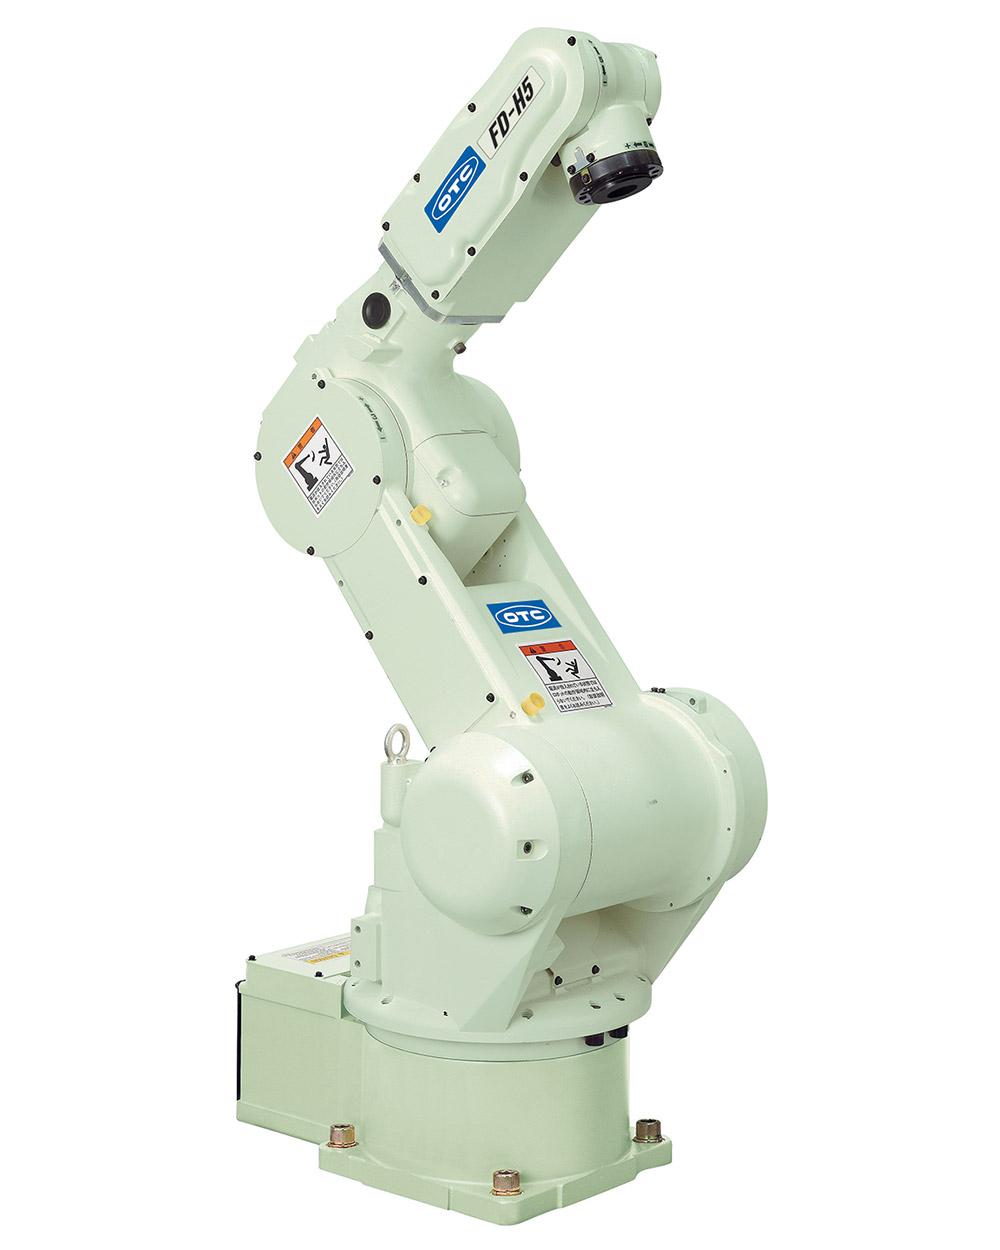 Robot soudeur, OTC, DAIHEN, FD-H5